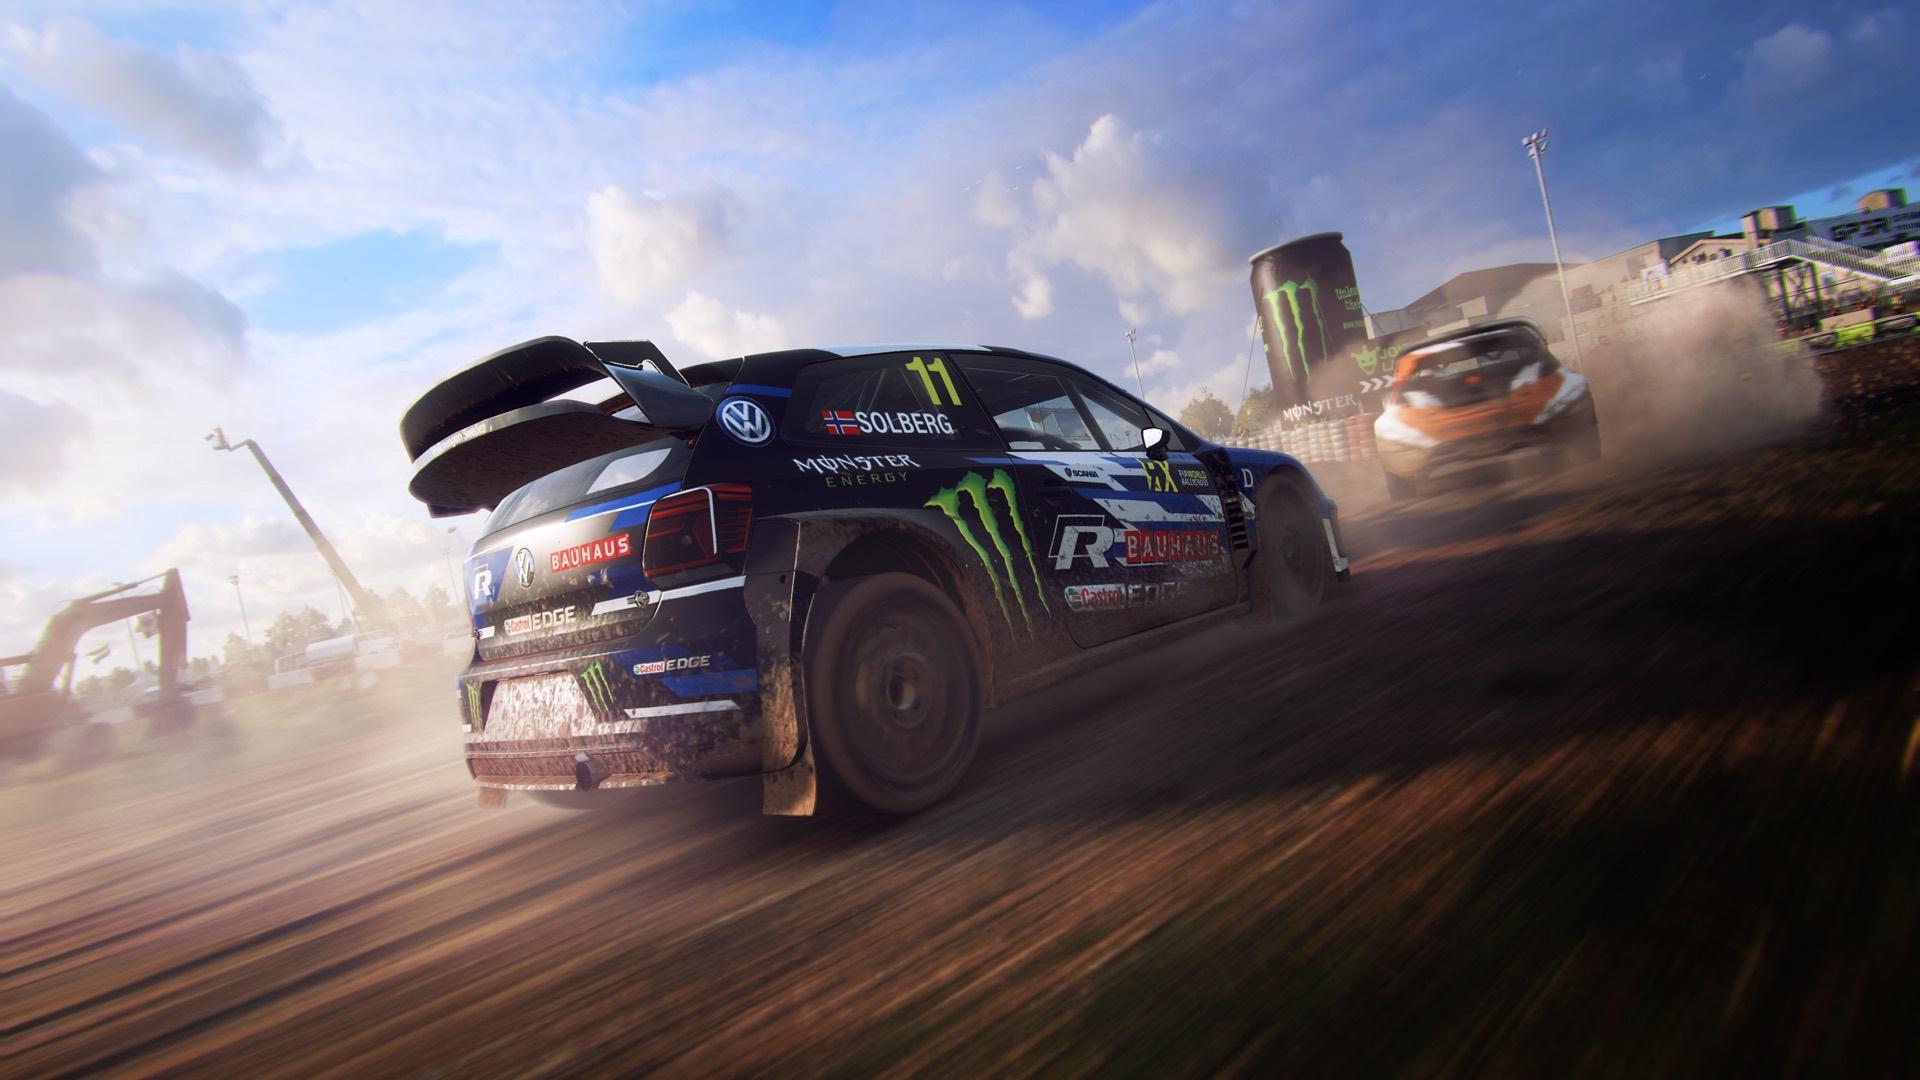 Top Car Wallpaper Dirt Rally 2 0 Une Vid 233 O Mettant Le Championnat Officiel